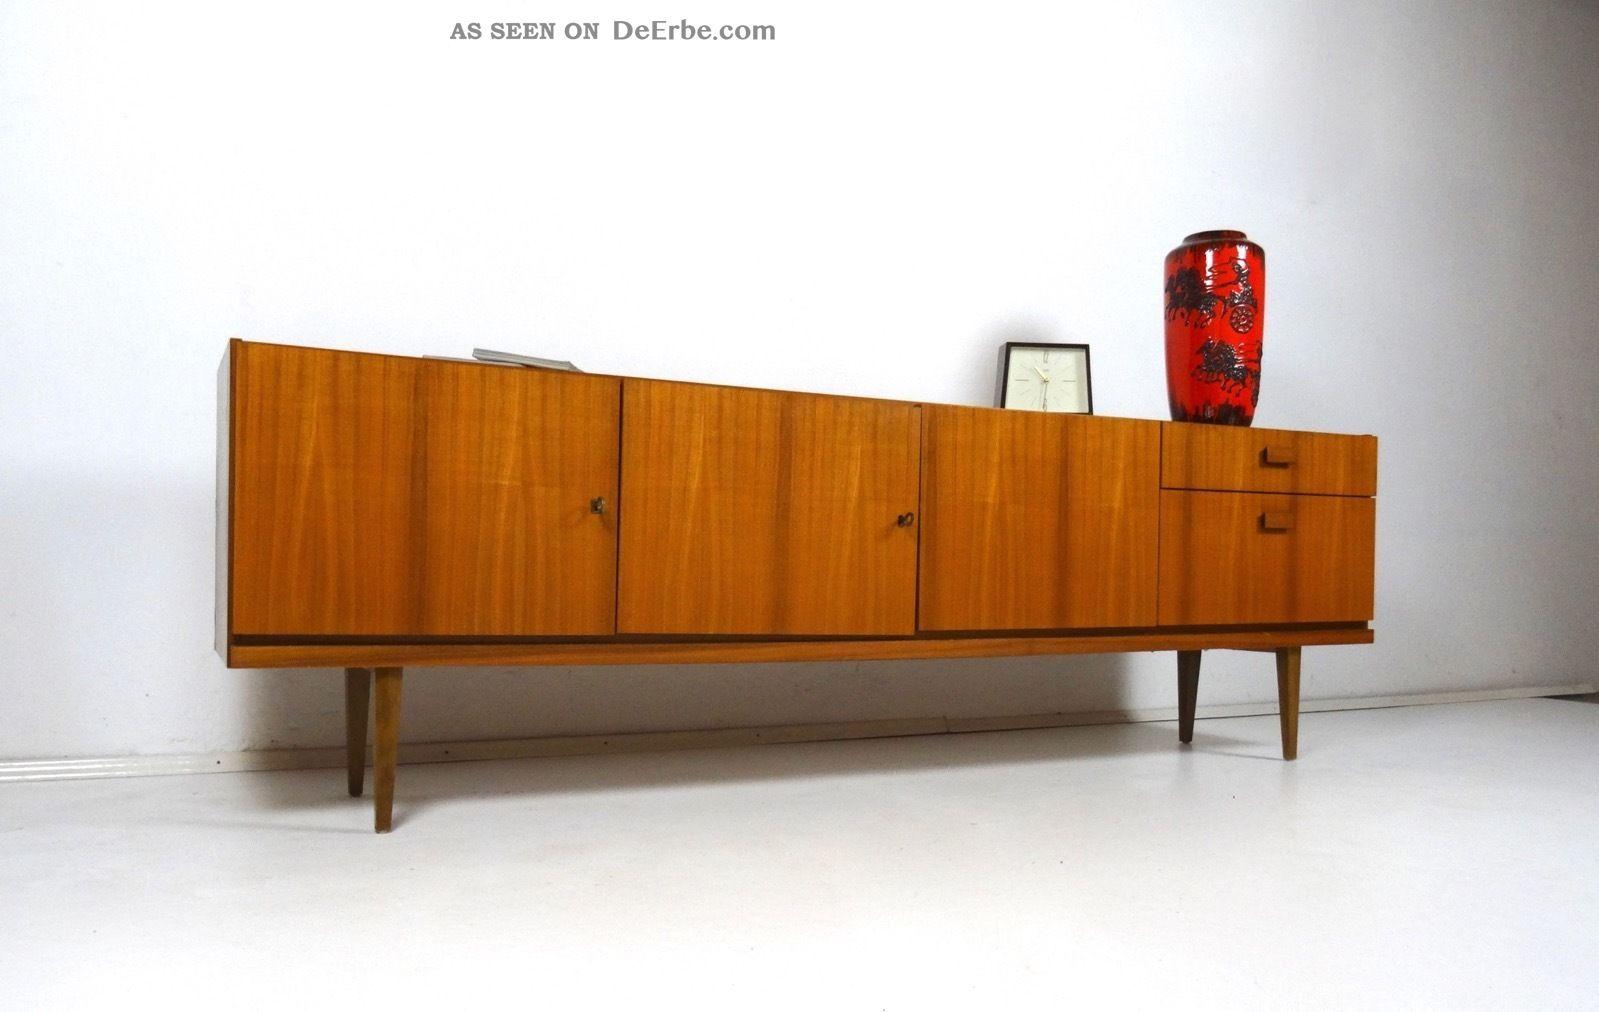 60er Design Sideboard Danish Modern MÖbel Teak Mid Century 50er 1960-1969 Bild